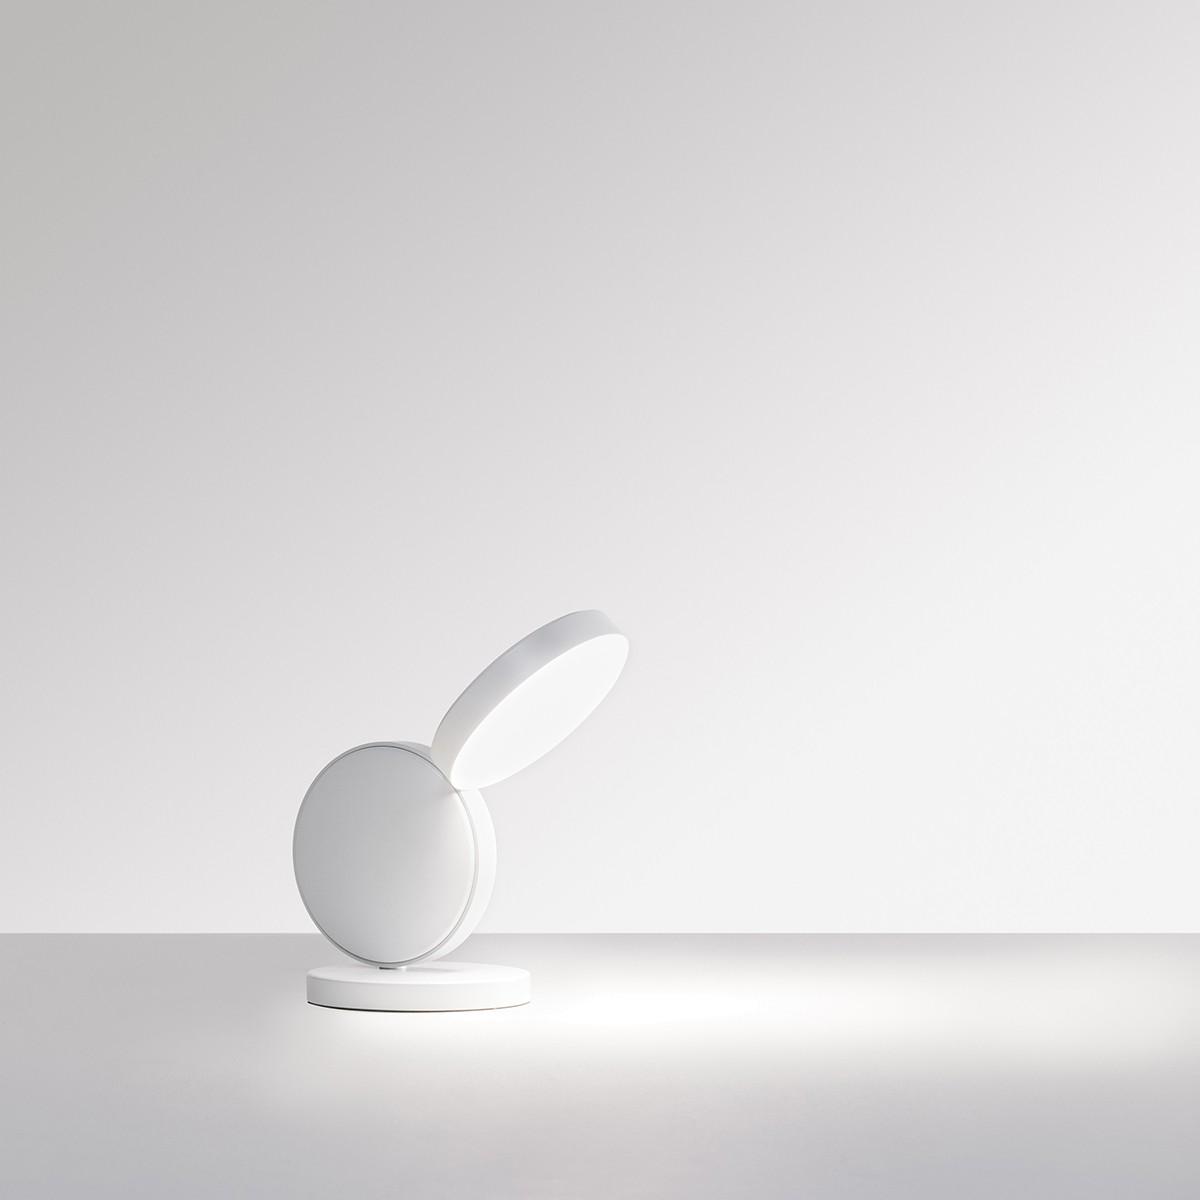 Fontana Arte Optunia LED Tischleuchte, Höhe: 24 cm, weiss